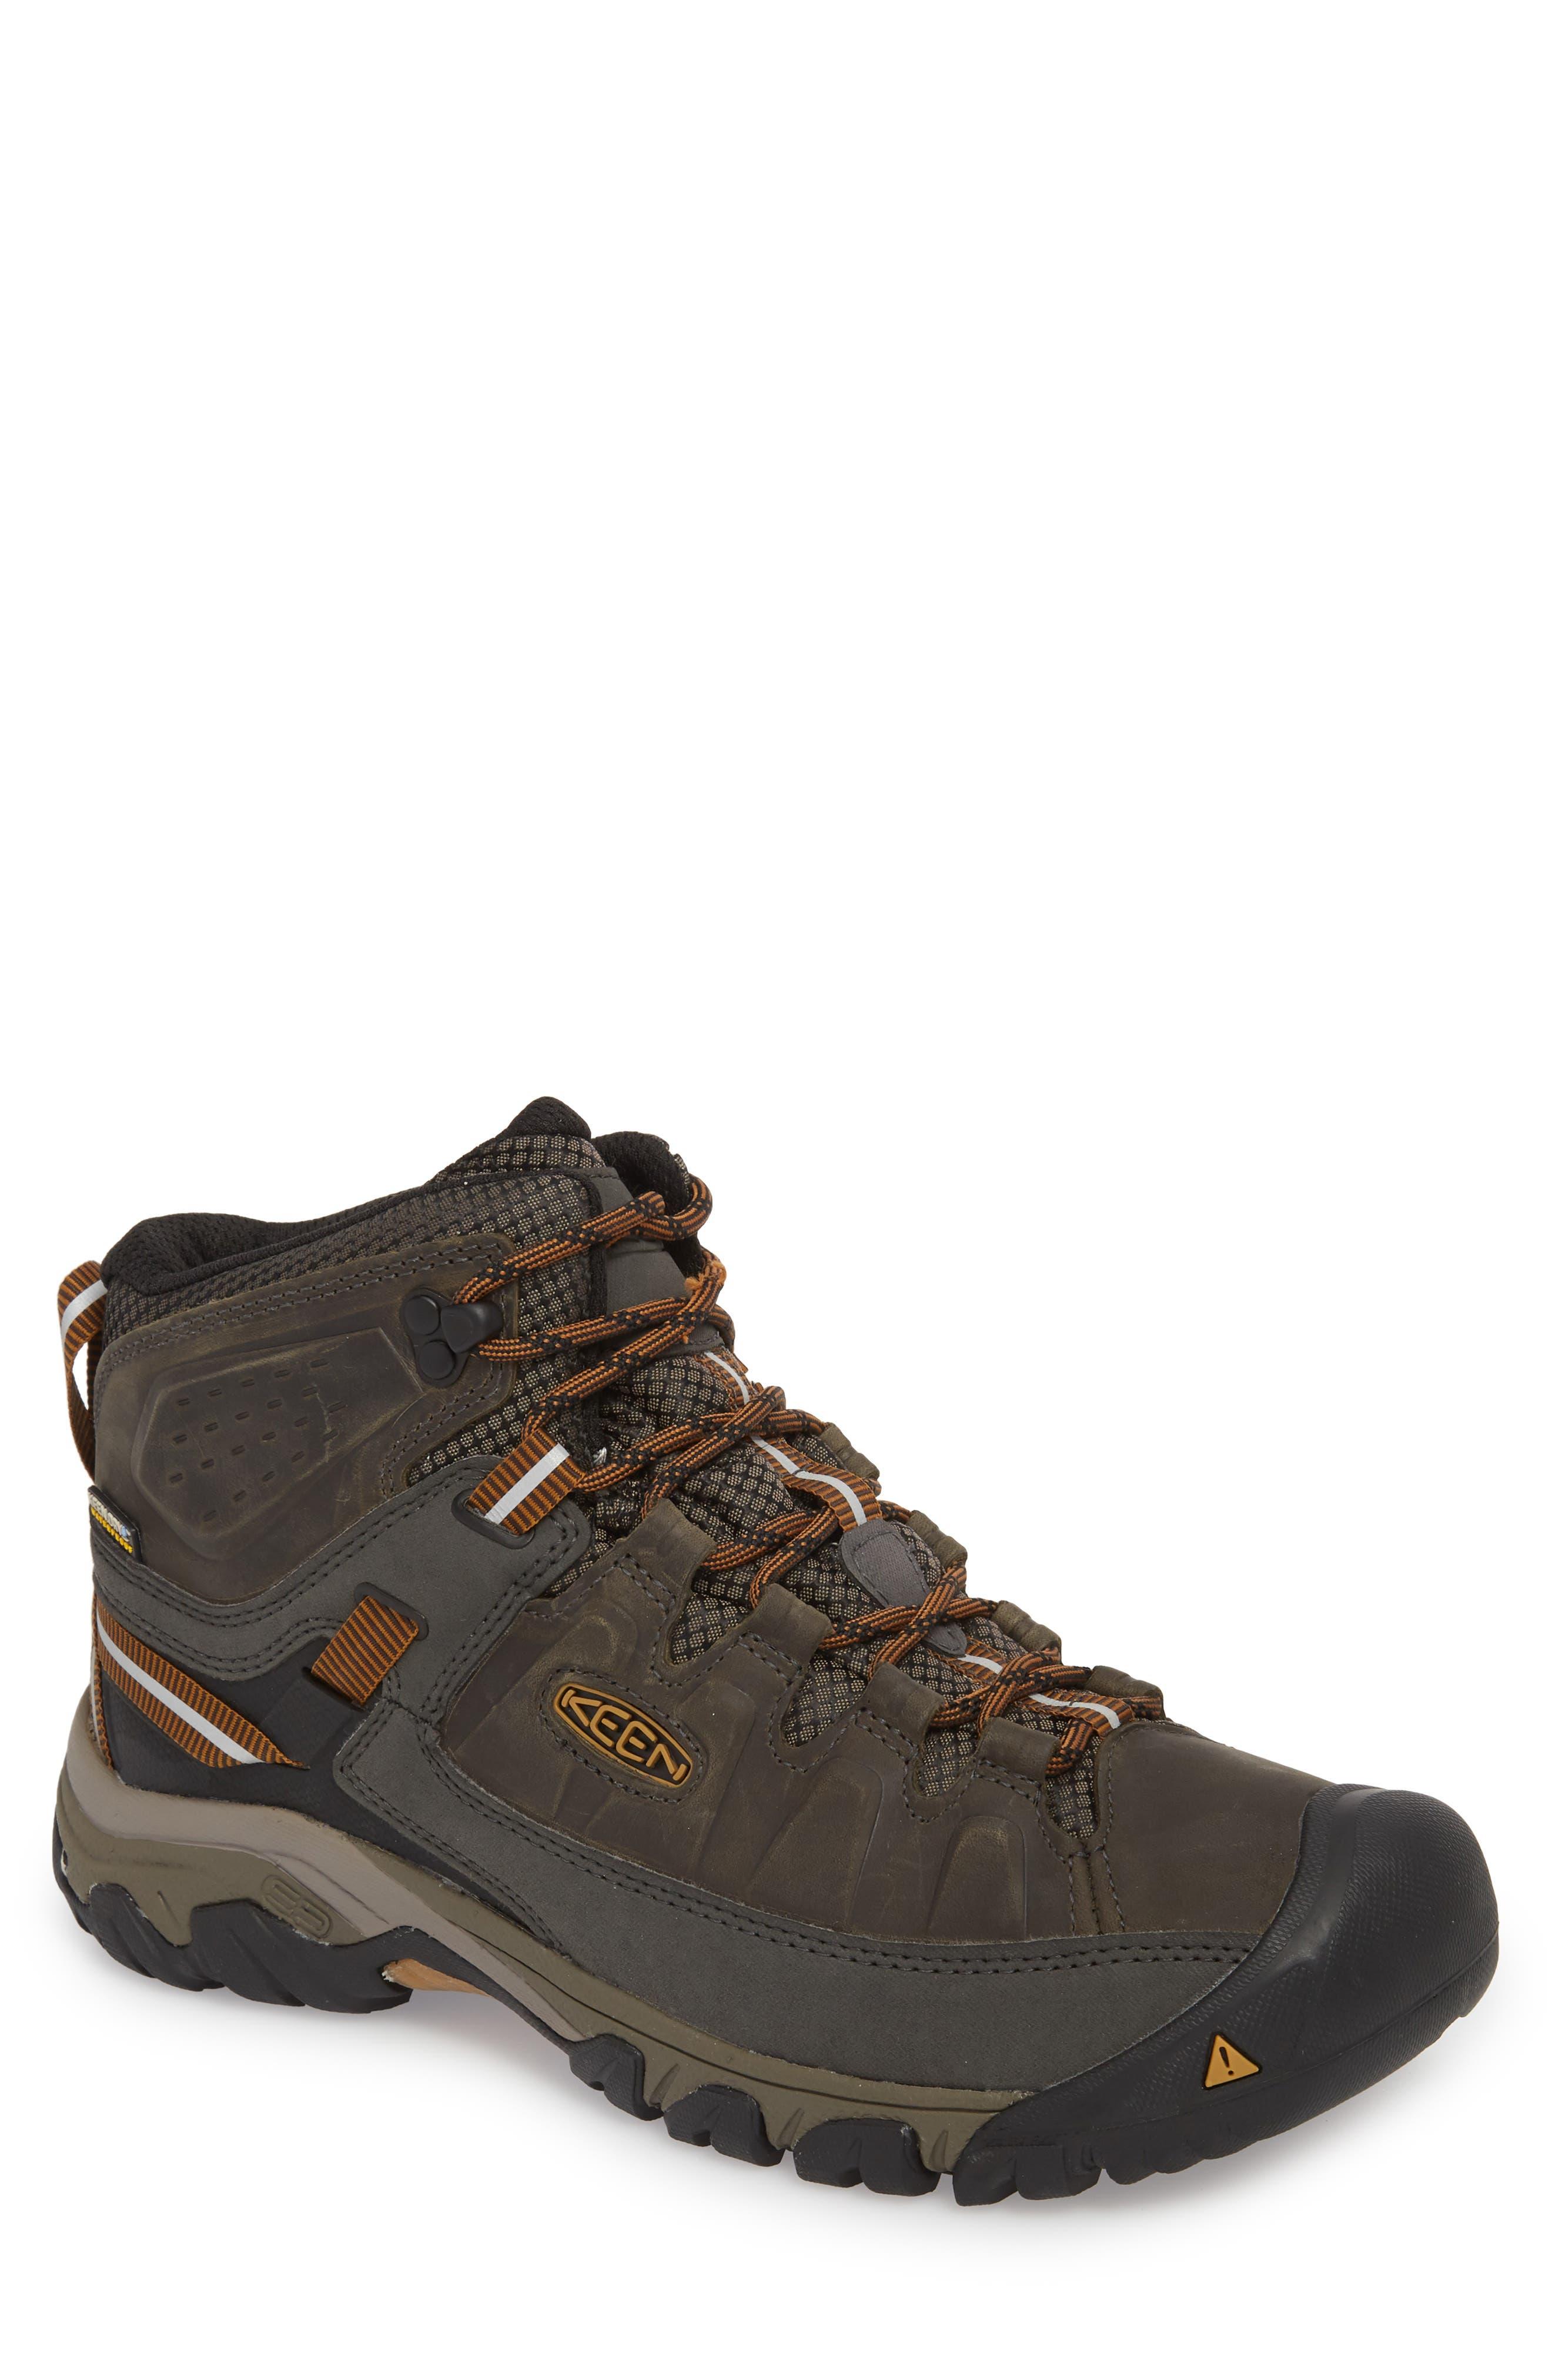 Targhee III Mid Waterproof Hiking Boot,                             Main thumbnail 1, color,                             BLACK OLIVE/GOLDEN BROWN